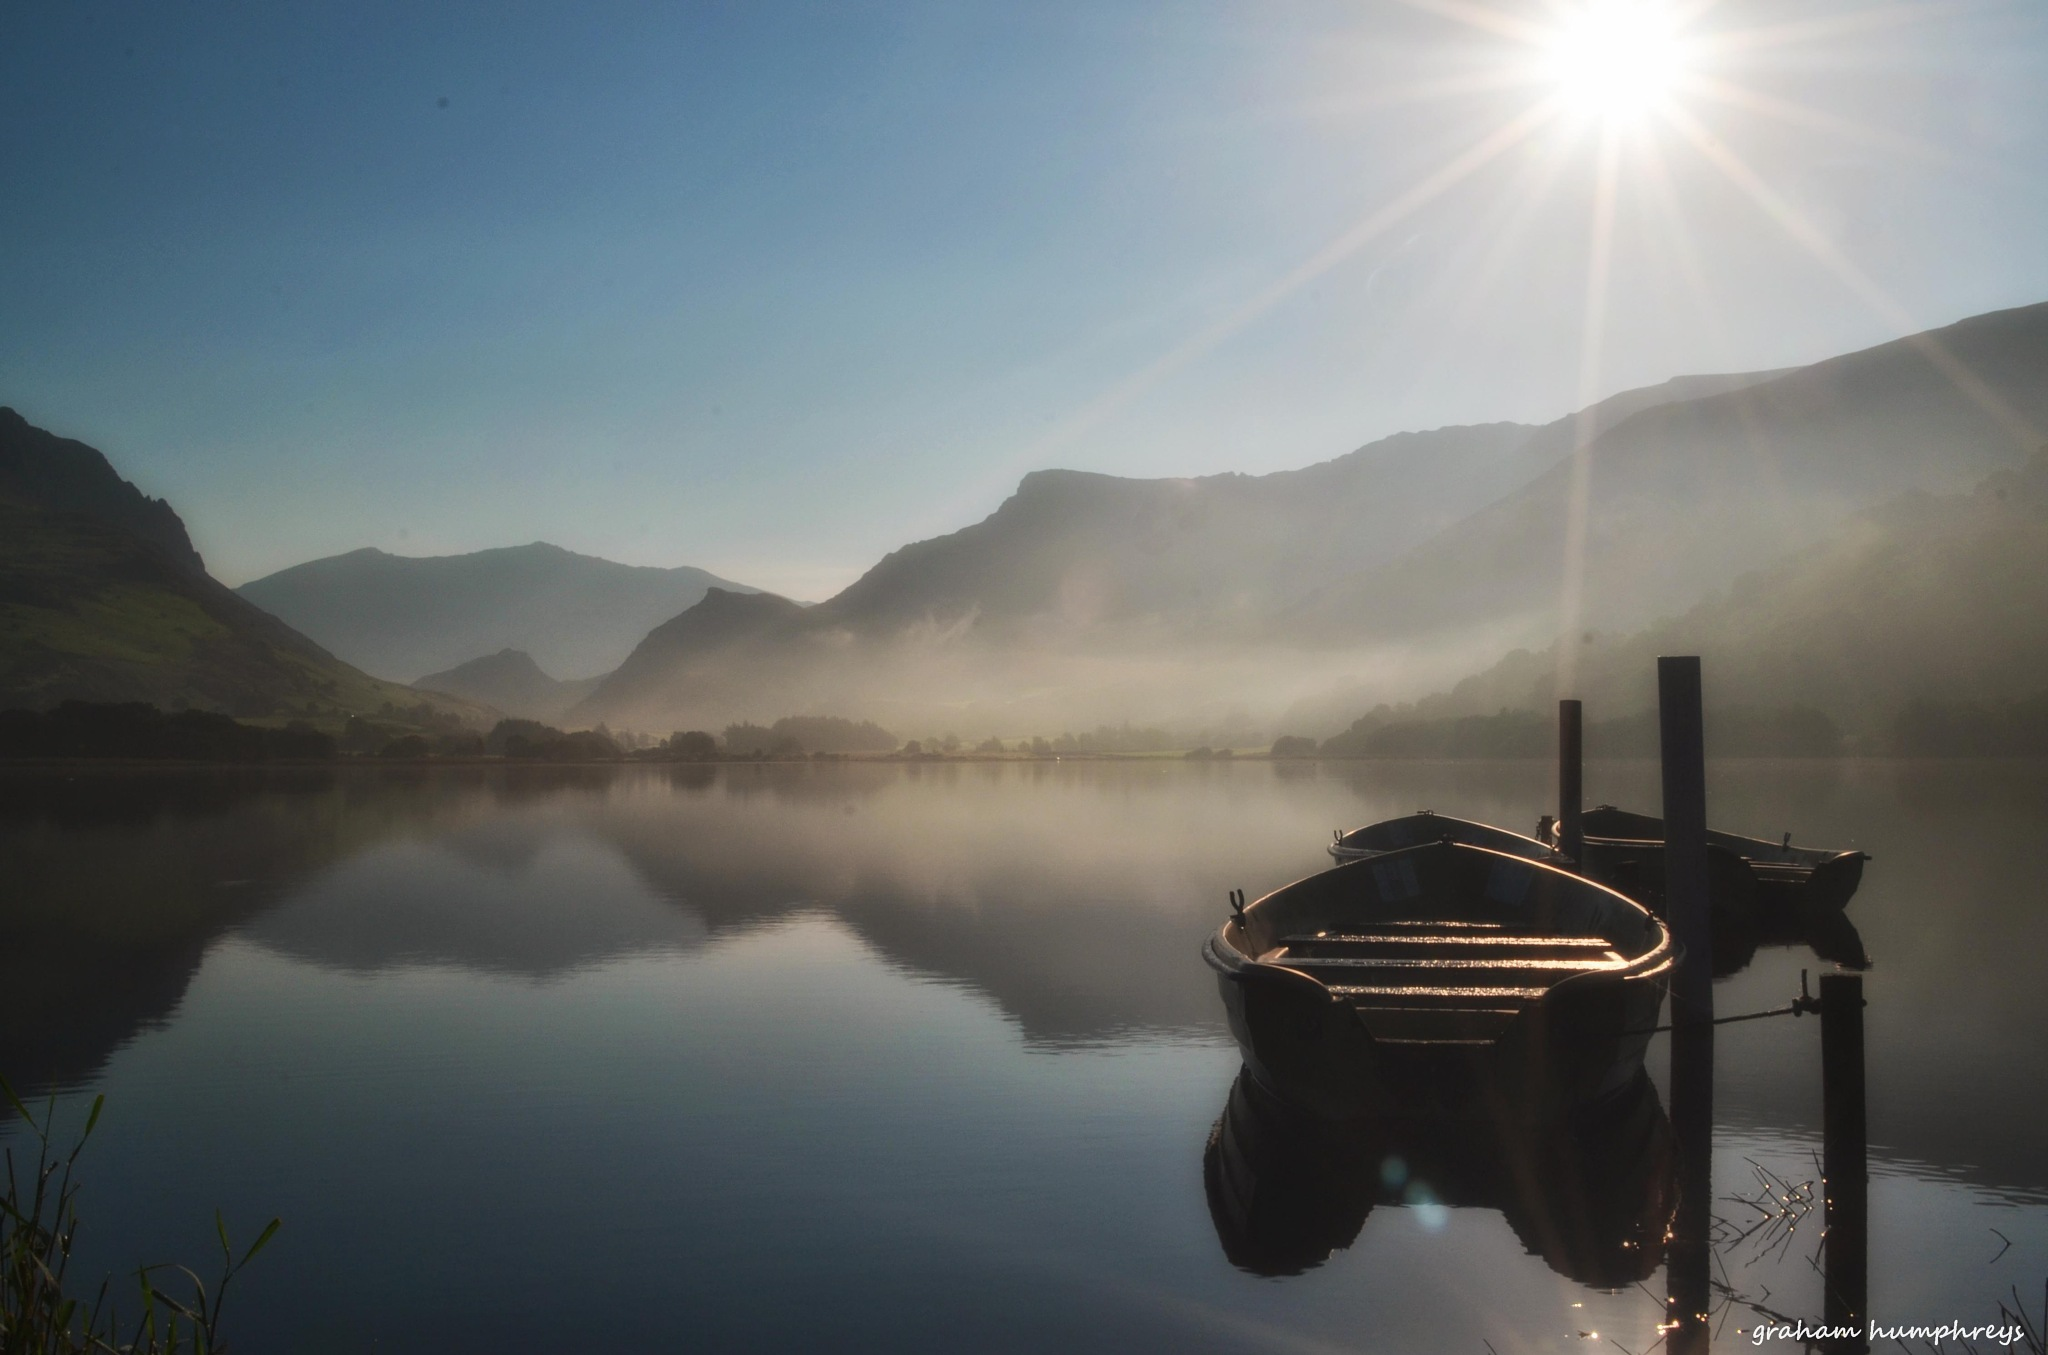 Misty morning by graham humphreys